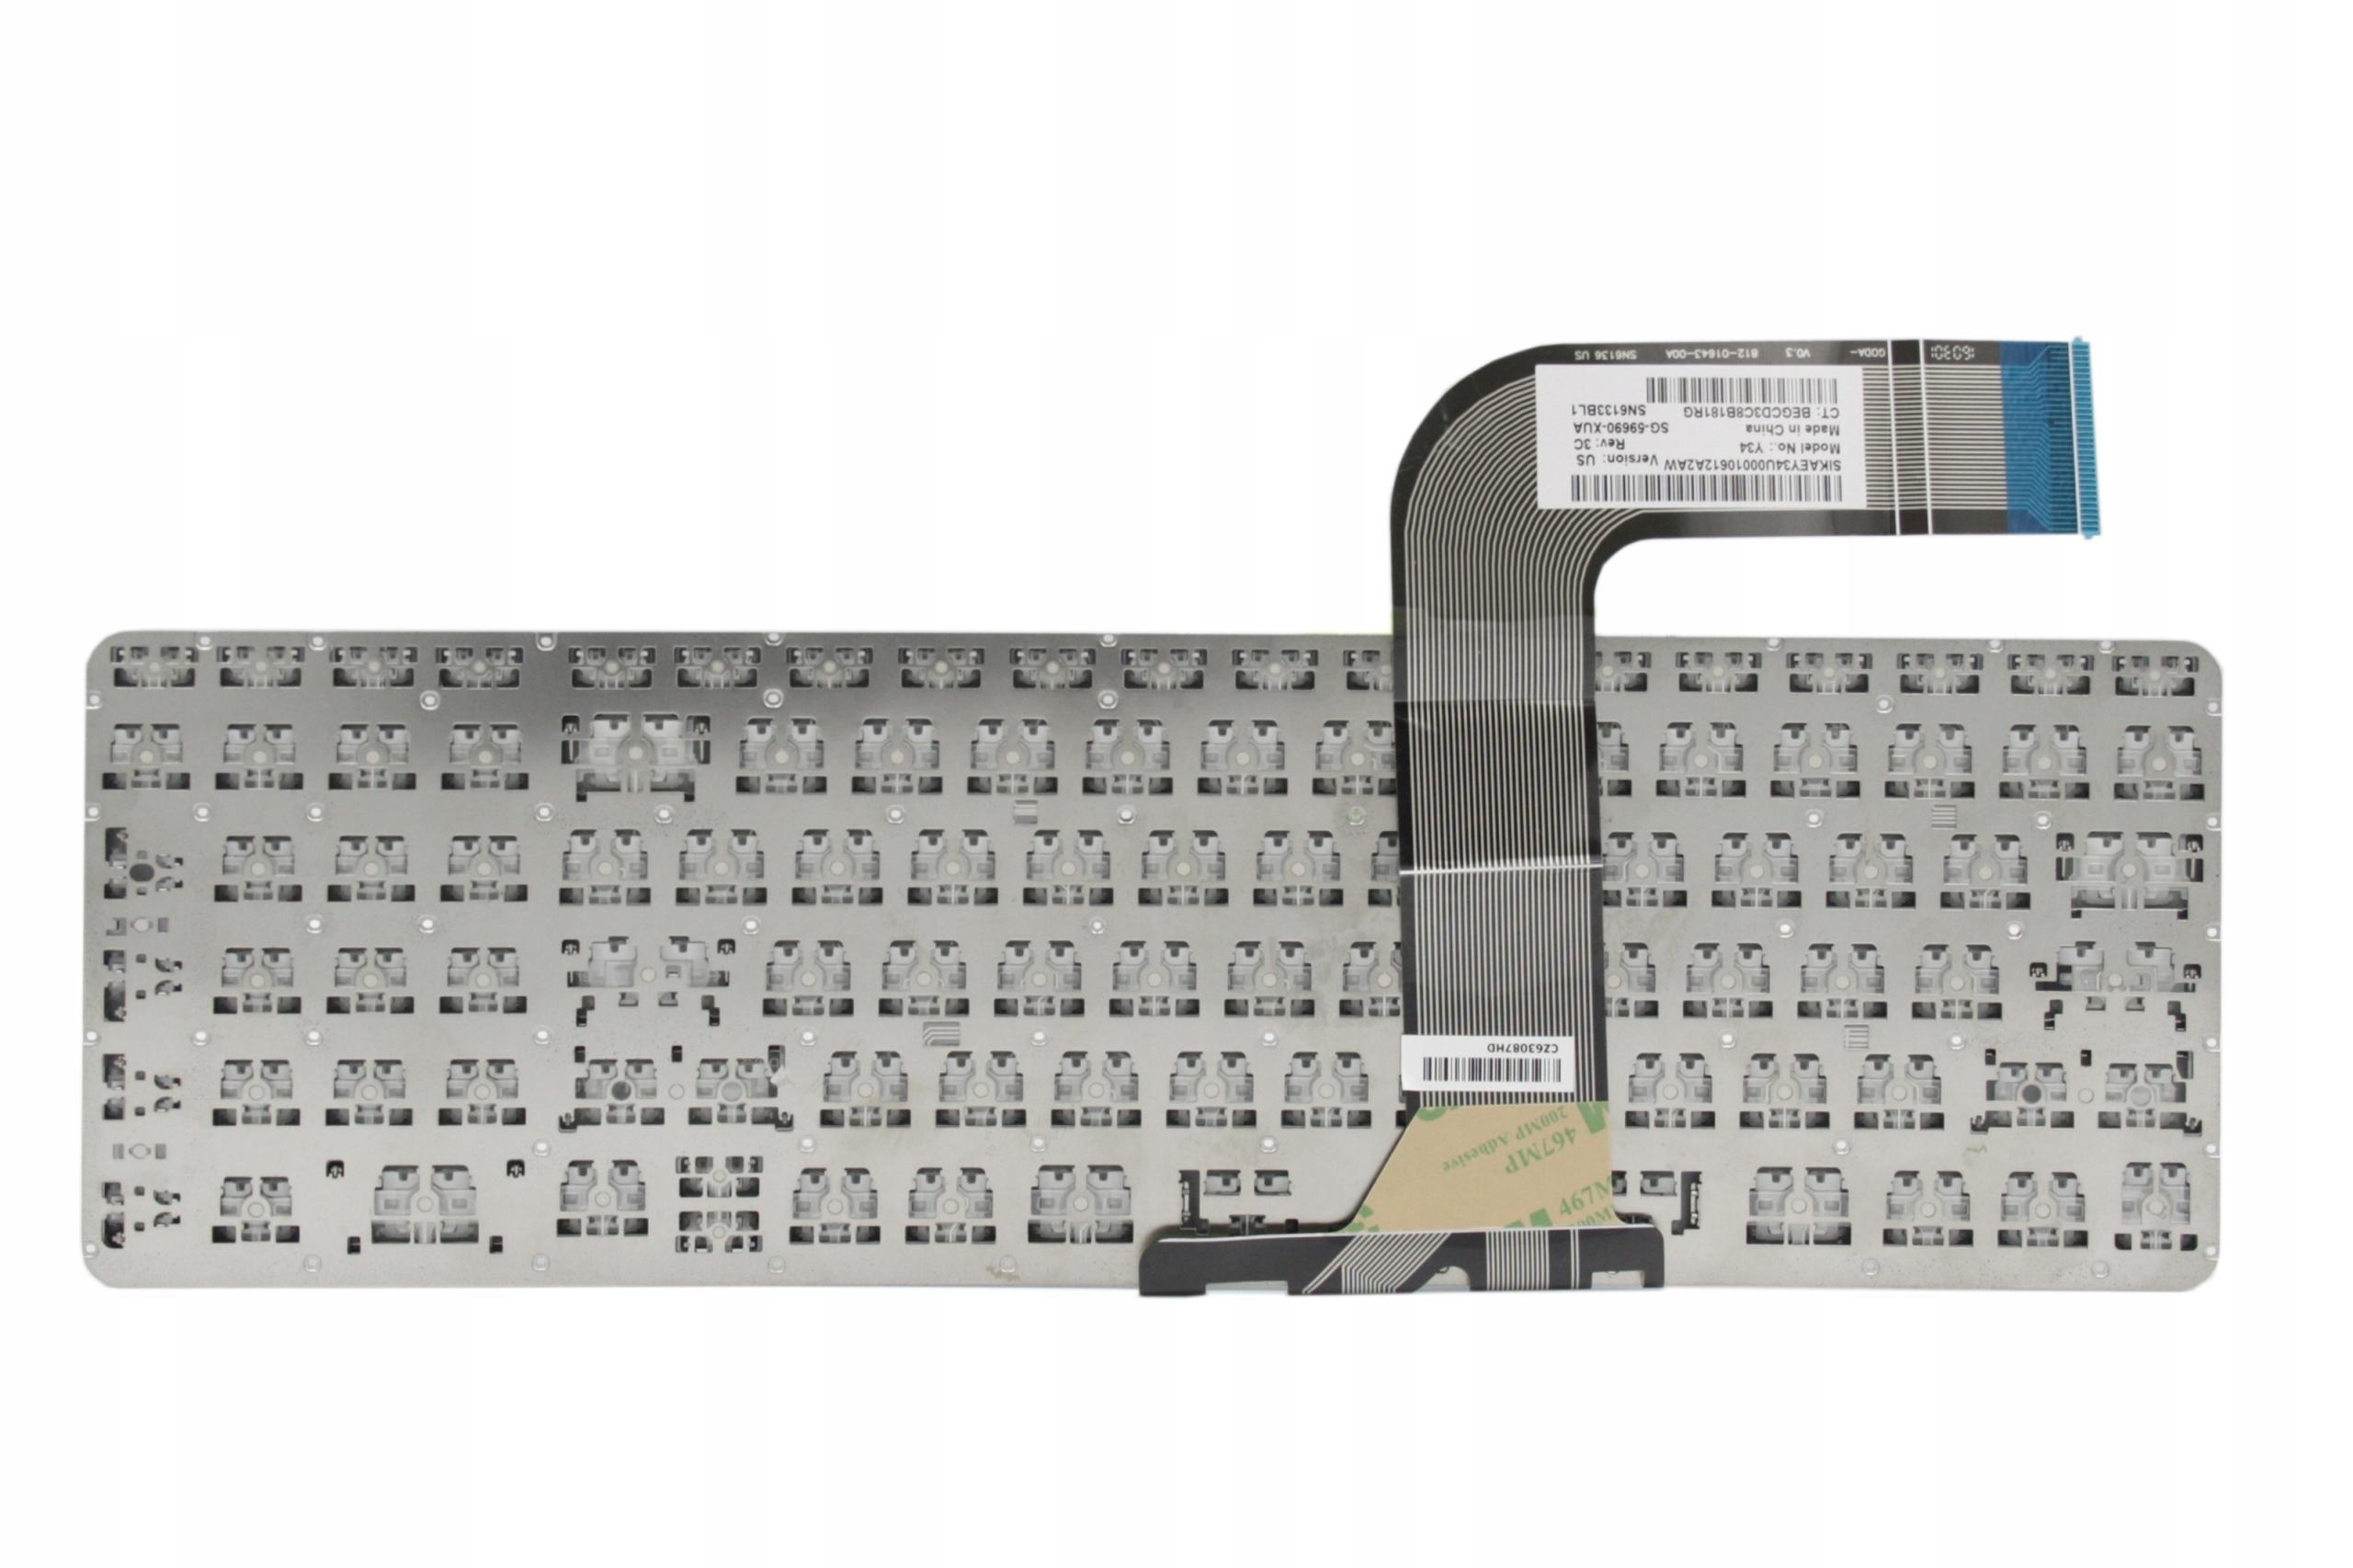 KLAWIATURA HP PAVILION 15-P 15-P080 17-F - Klawiatury do laptopów